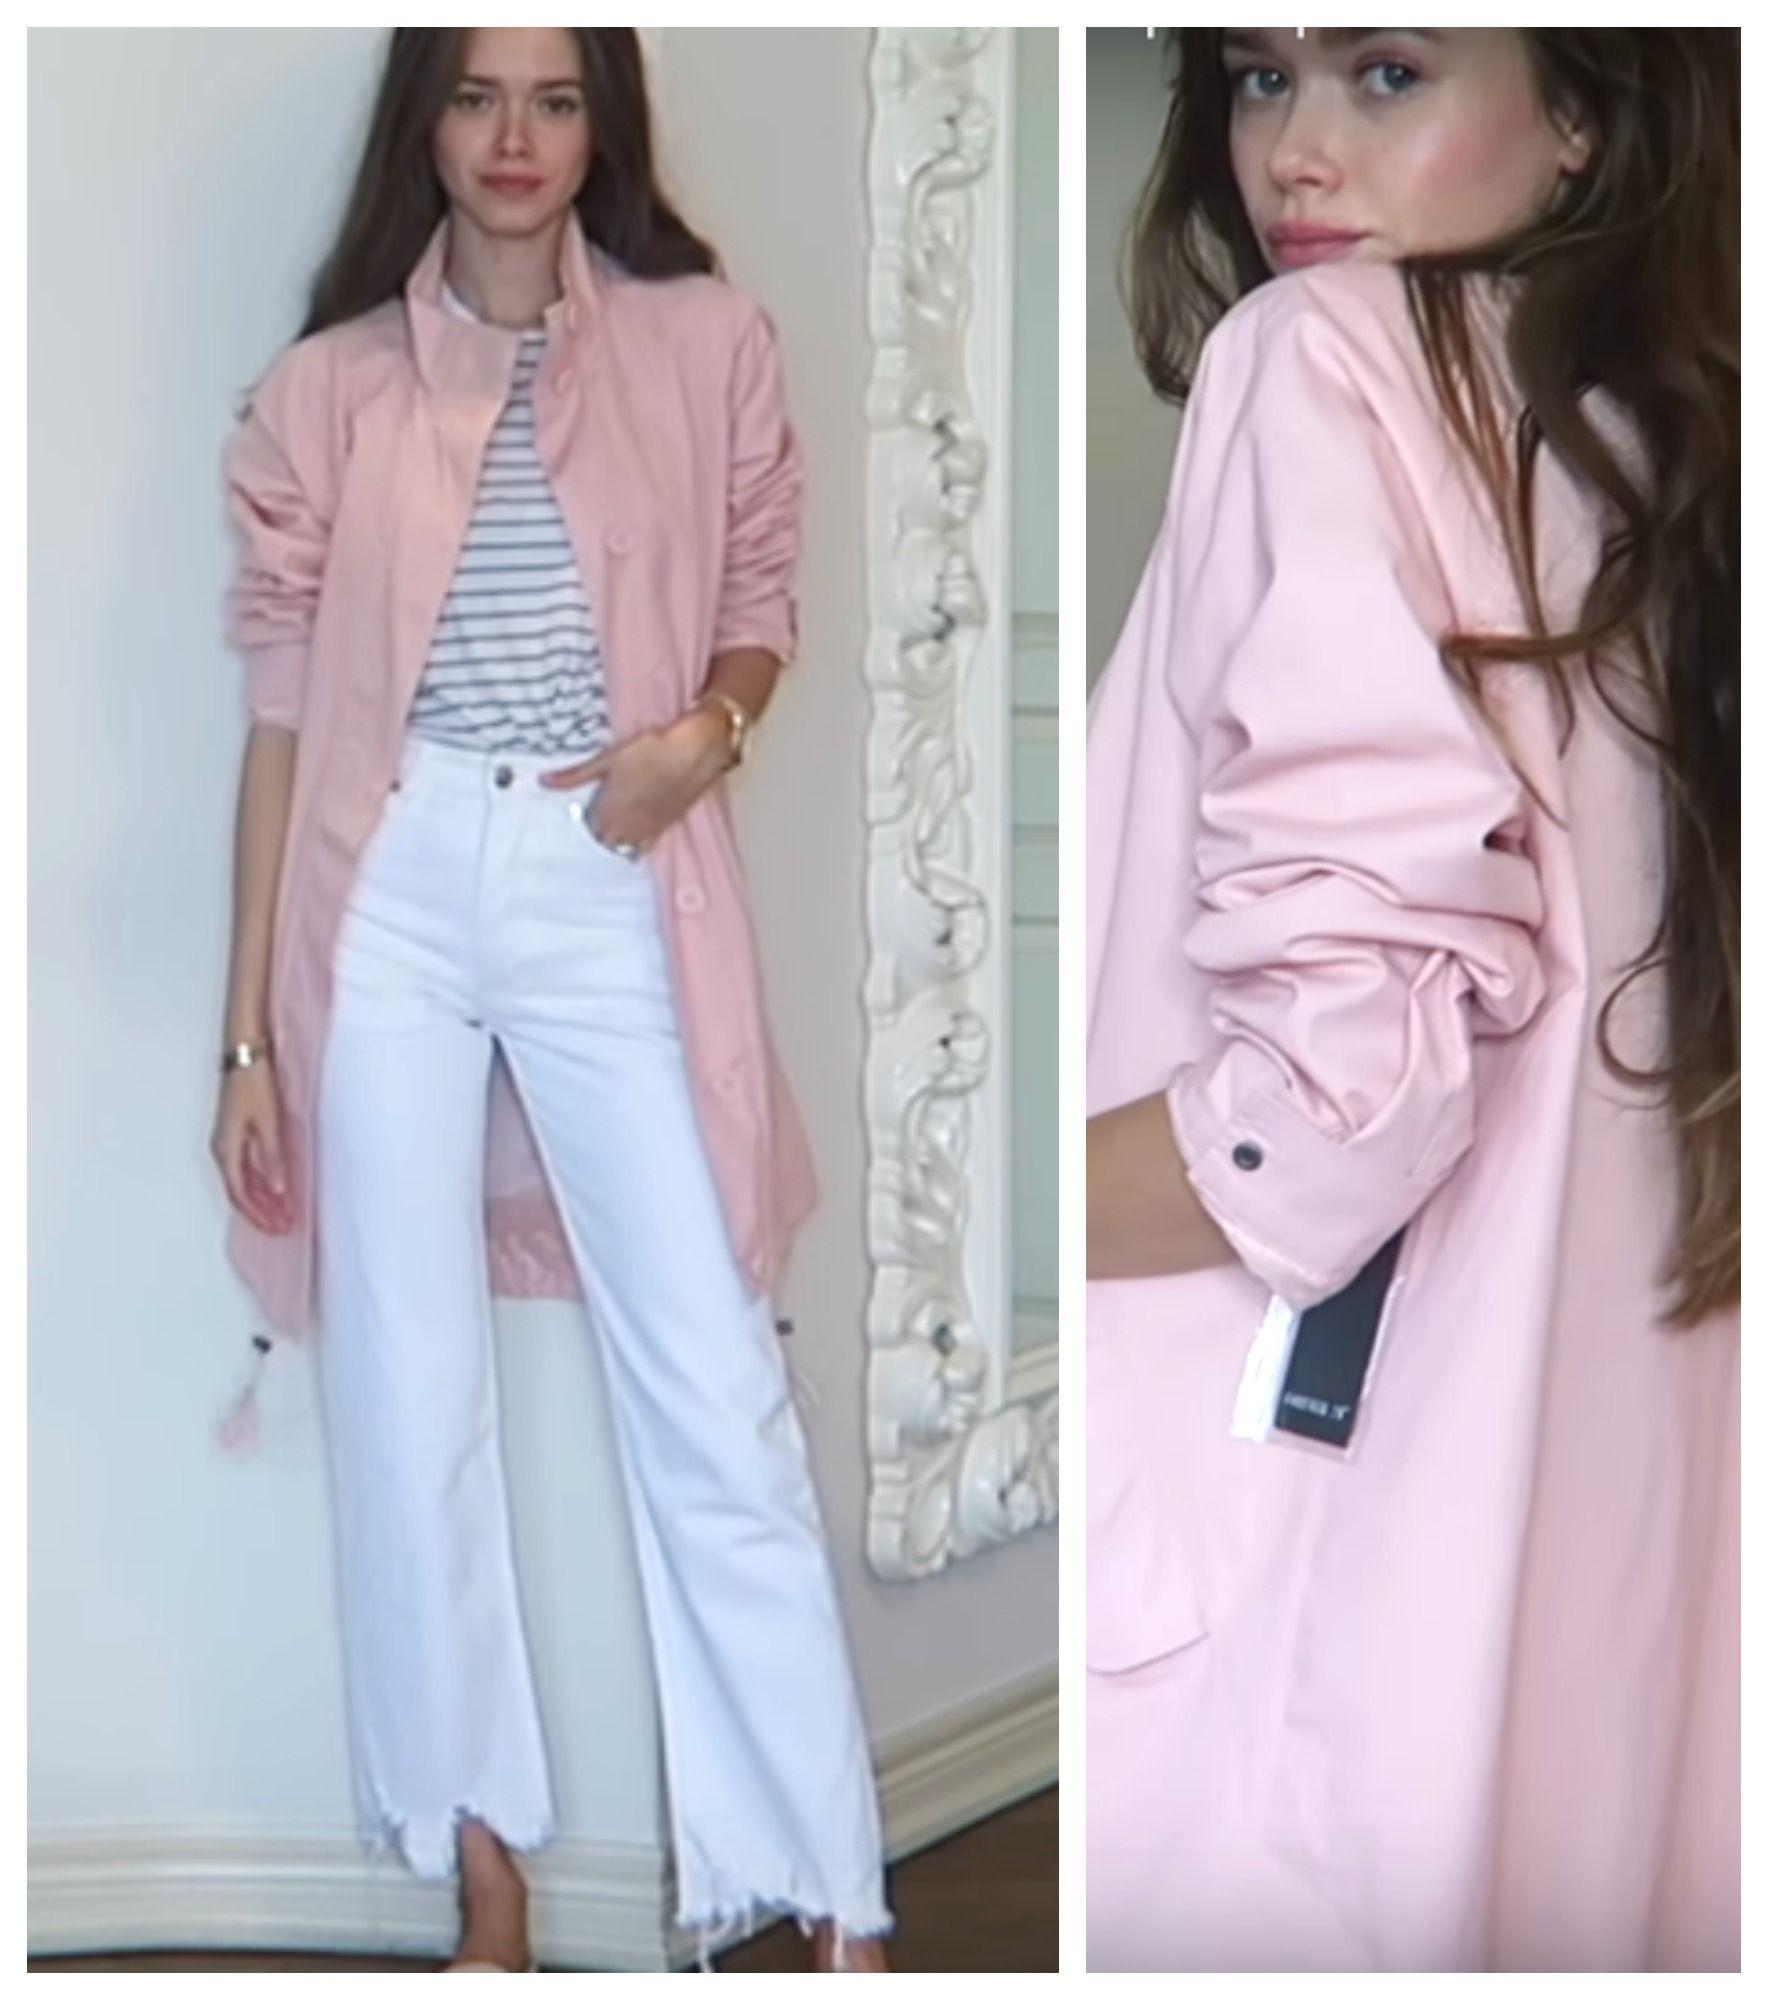 62f2ad32a301 valeria lipovetsky lookbook #youtube #fashion #model | My Style in ...